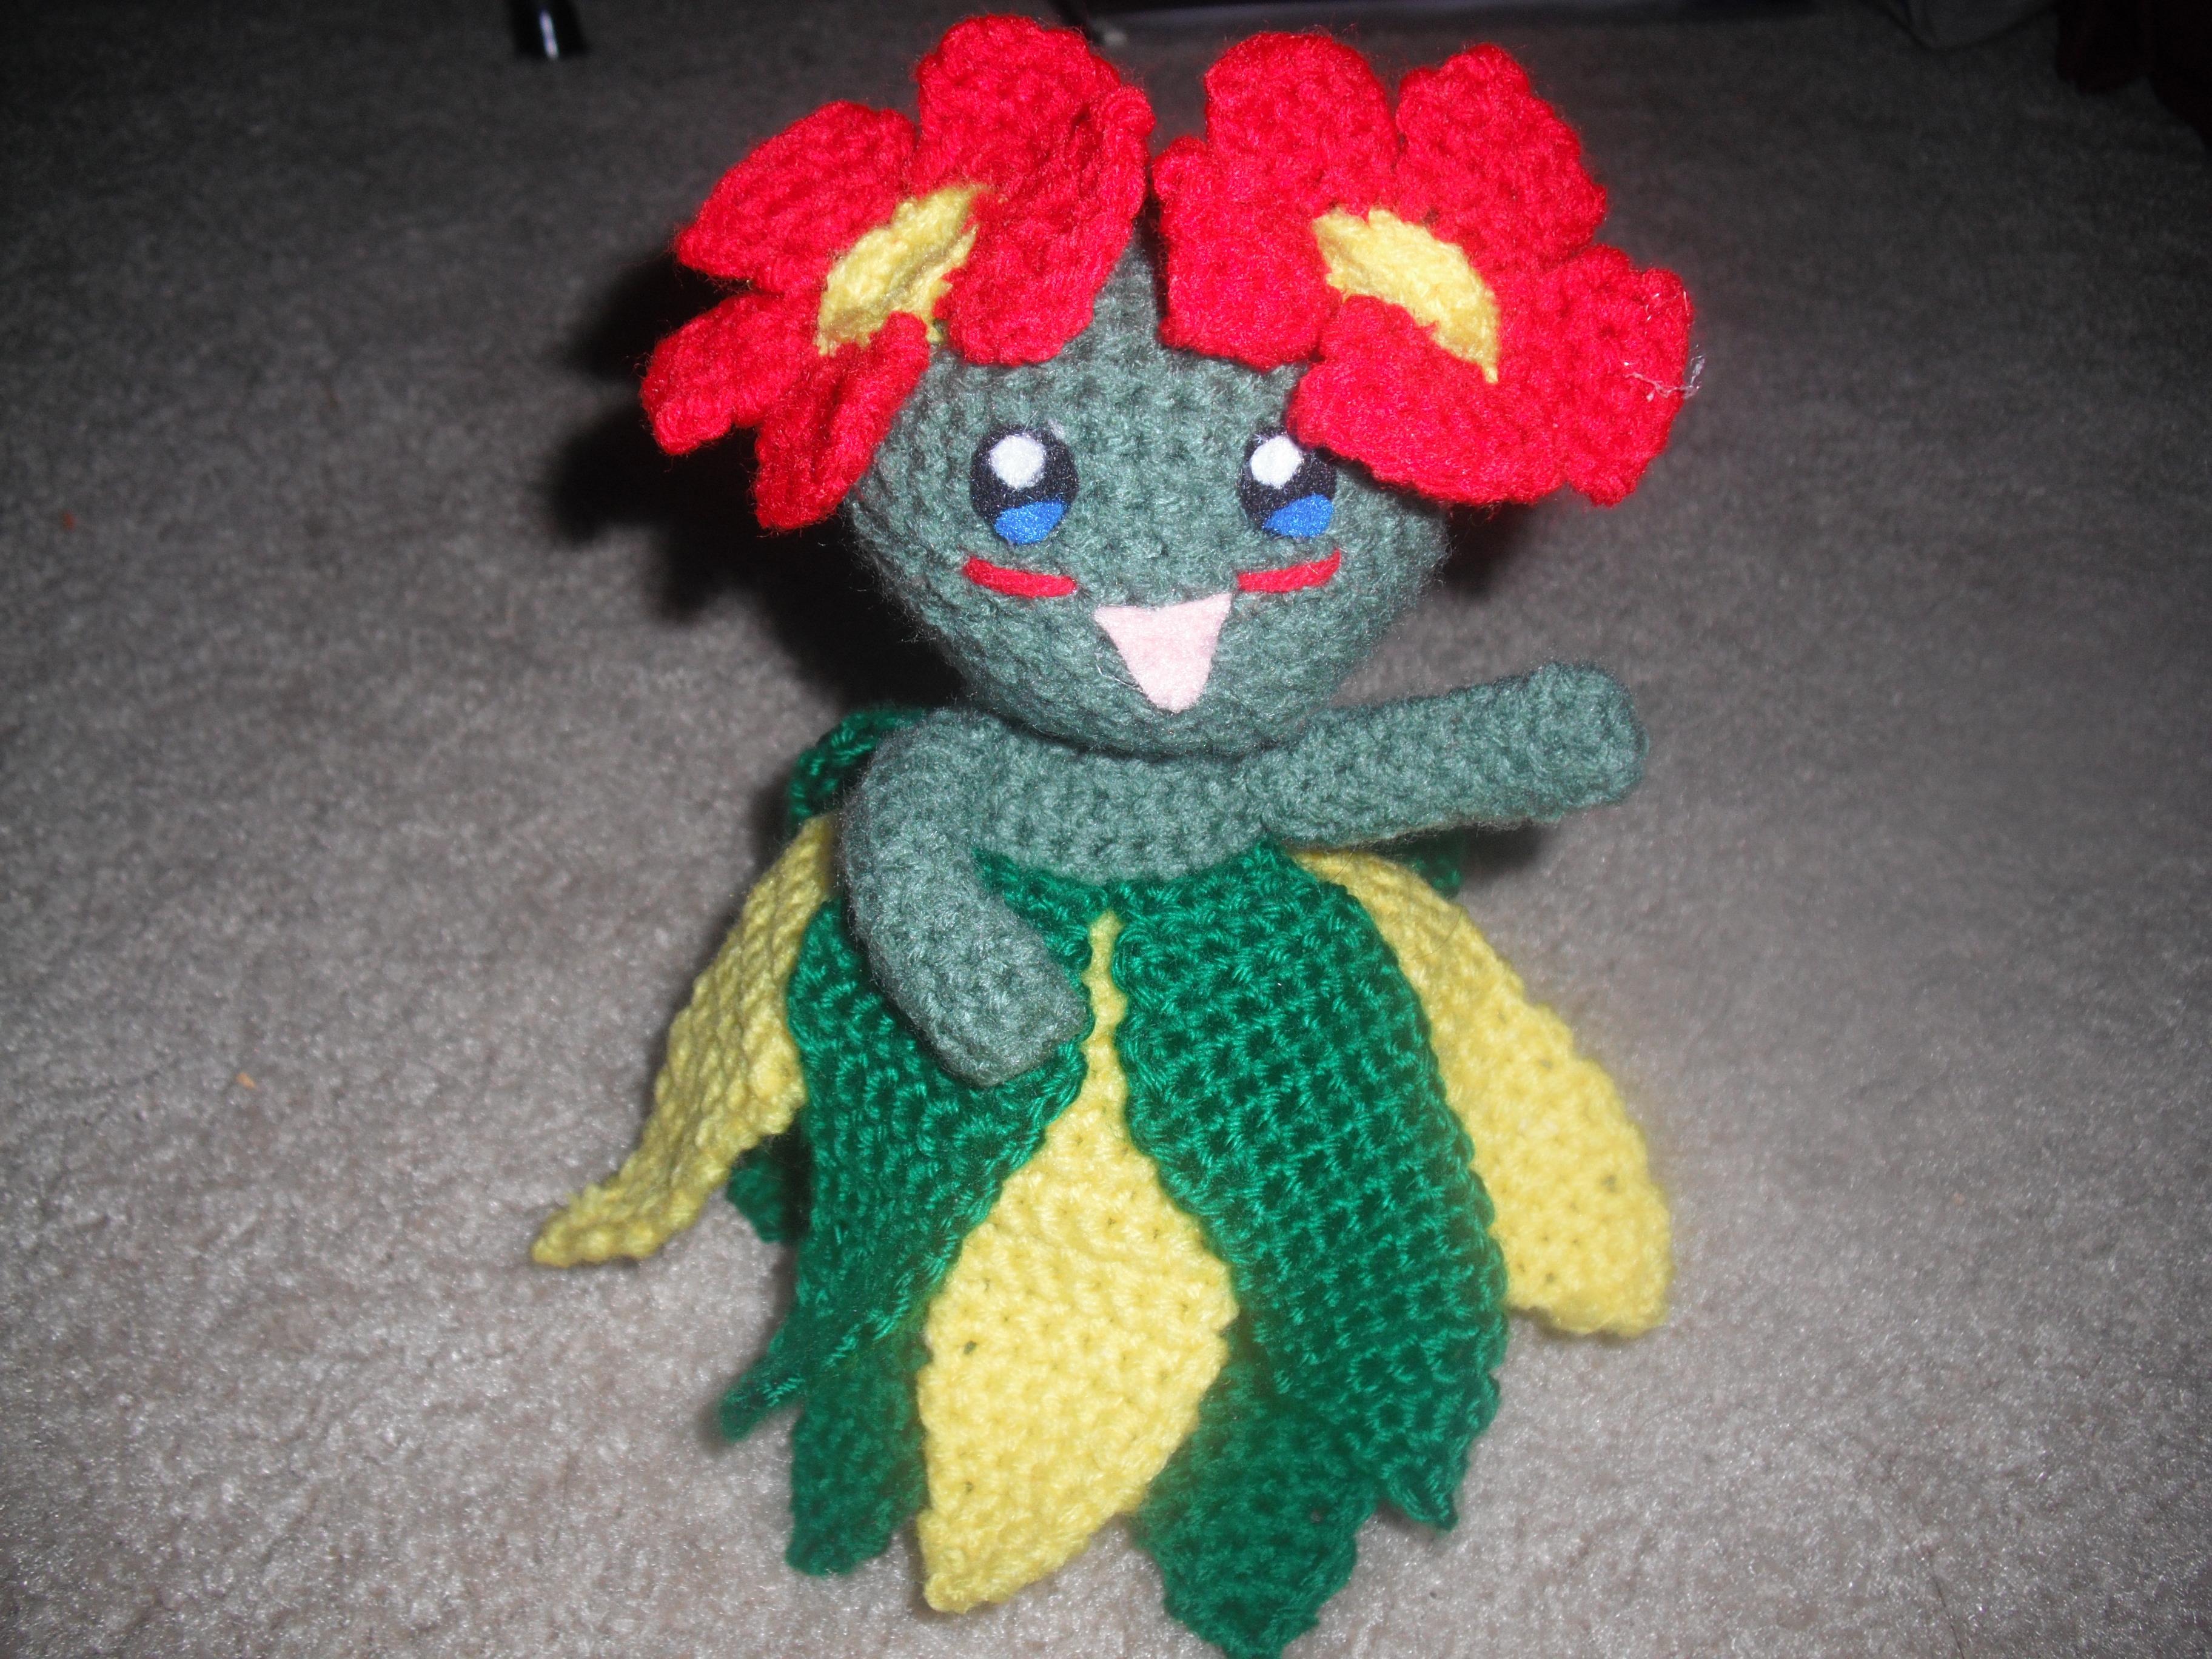 Crochet Patterns For Pokemon : Bellossom AH! Creations